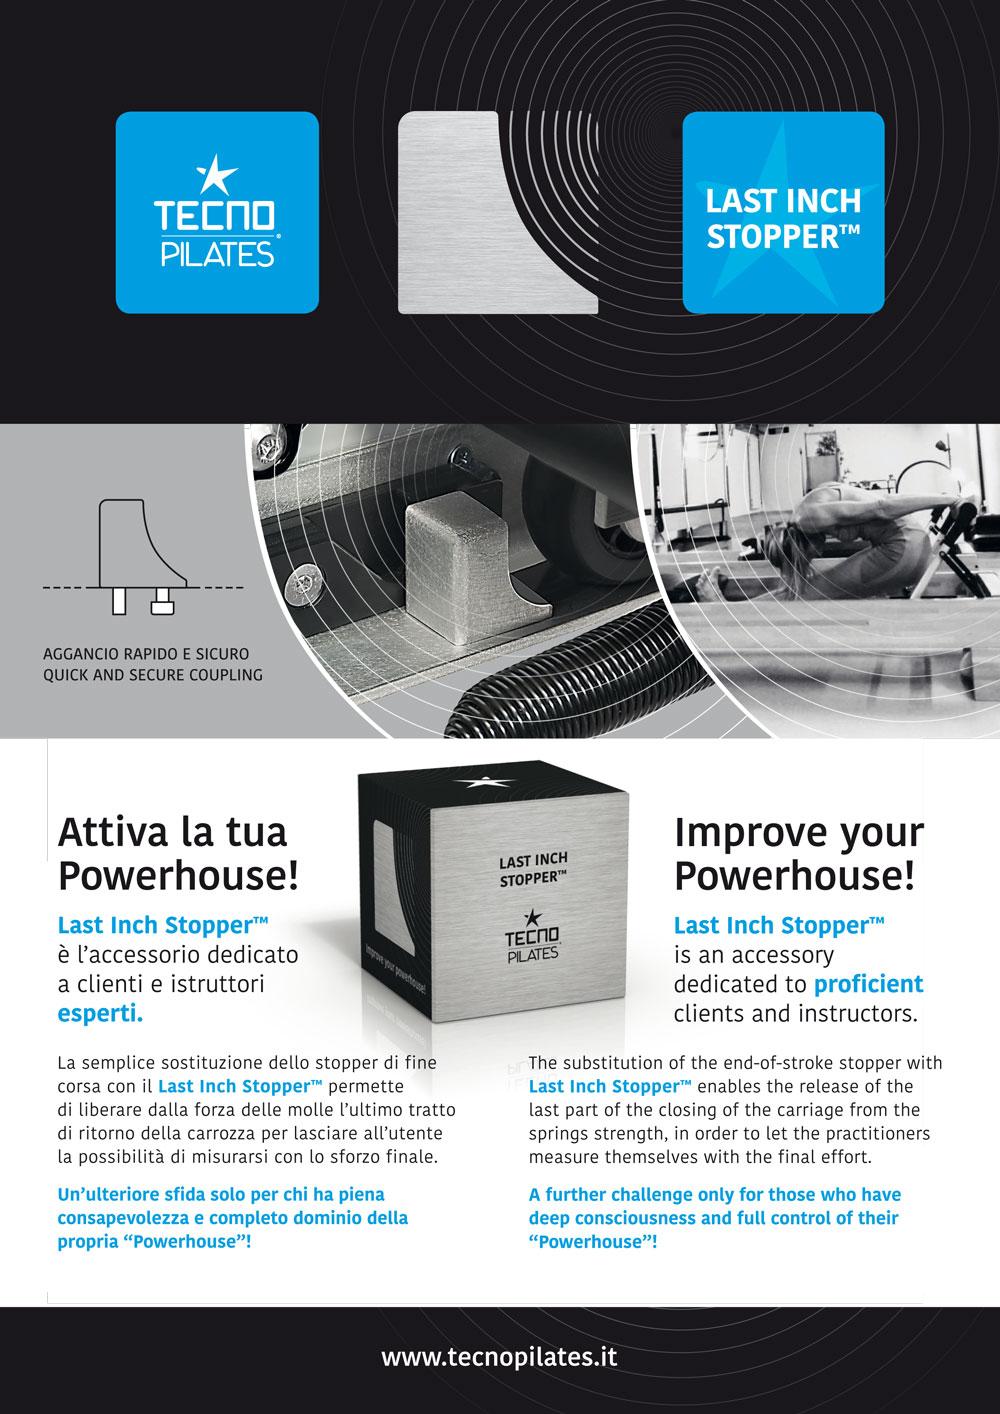 Last Inch Stopper - attrezzi pilates / pilates equipment